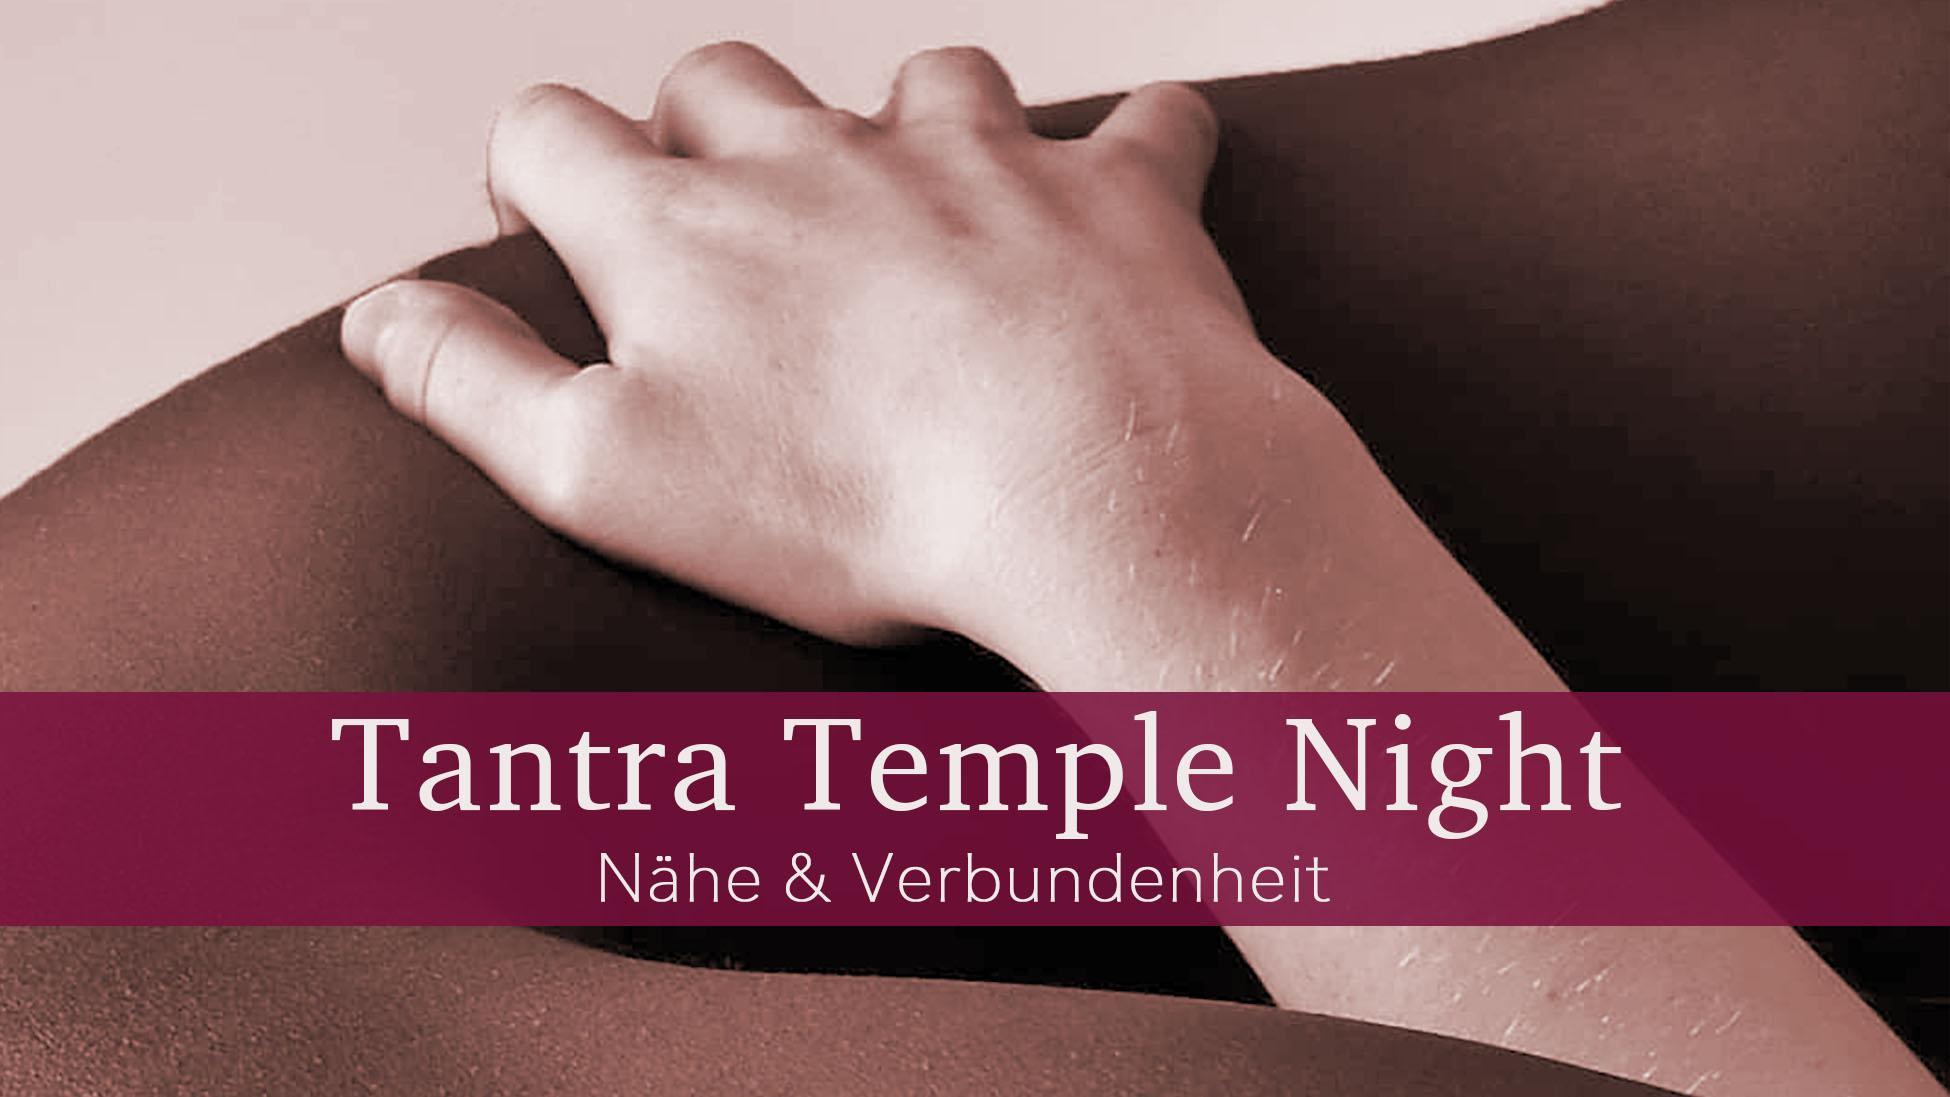 Tantra Temple Night - Nähe & Verbundenheit - verlegt auf MAI